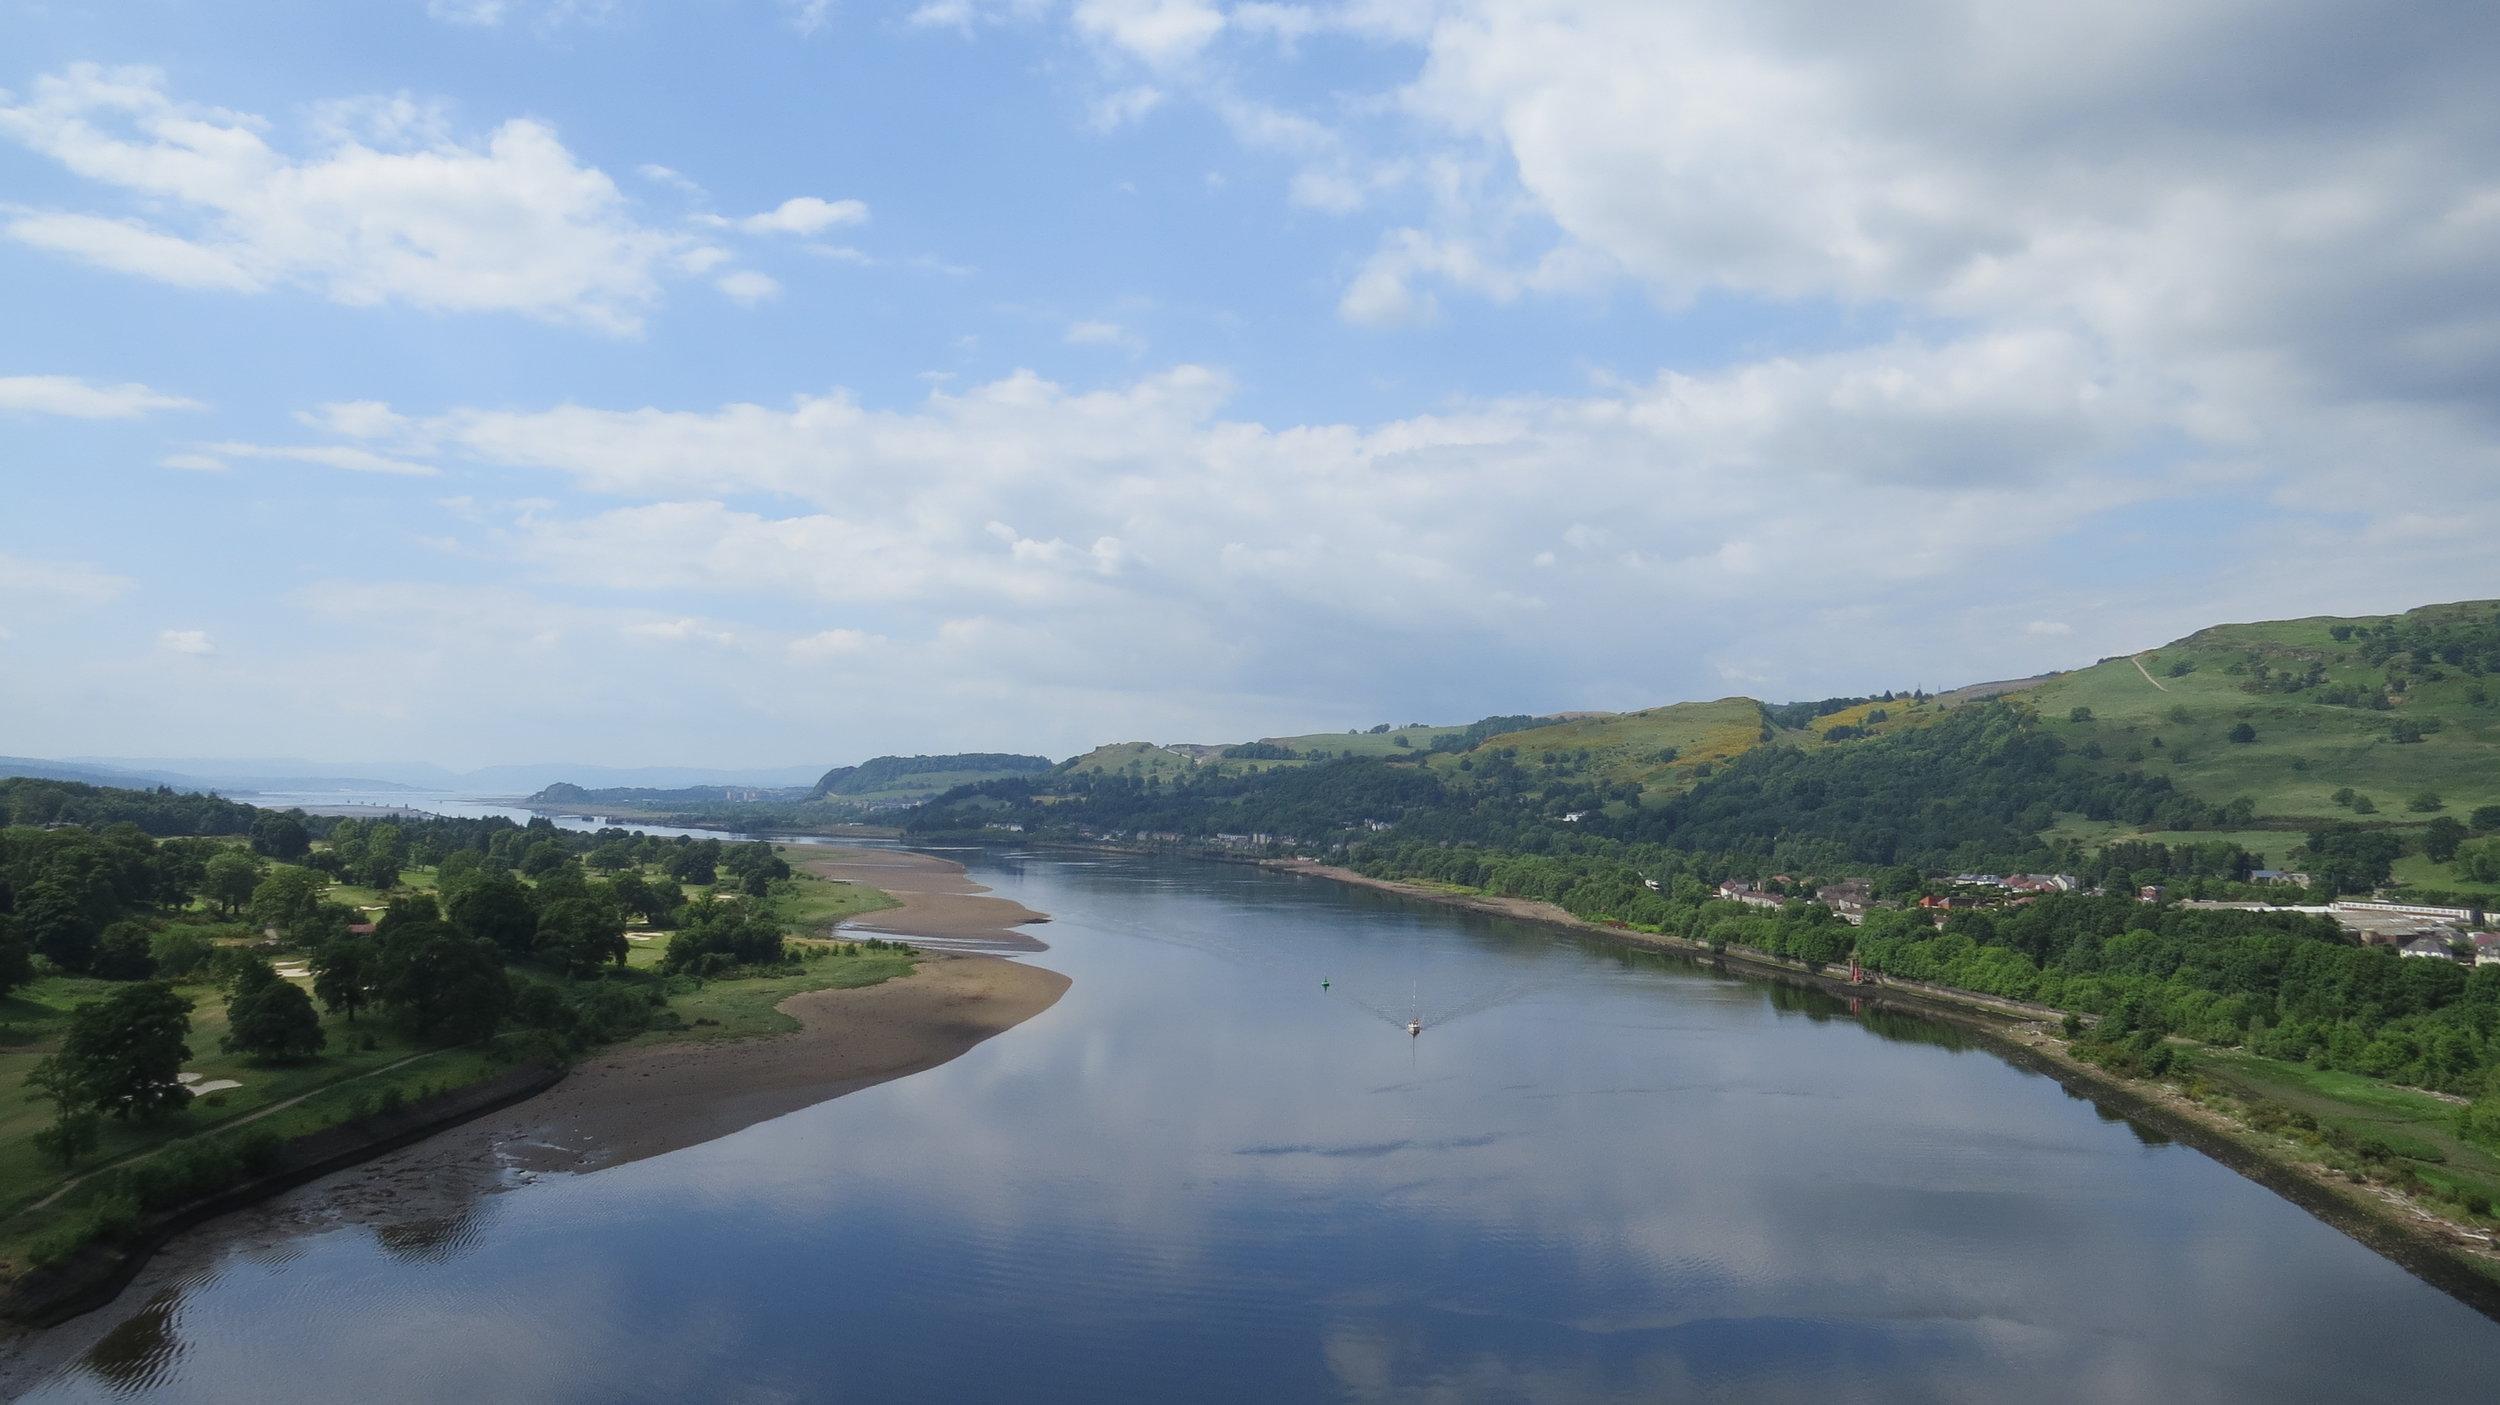 View from Erskine Bridge